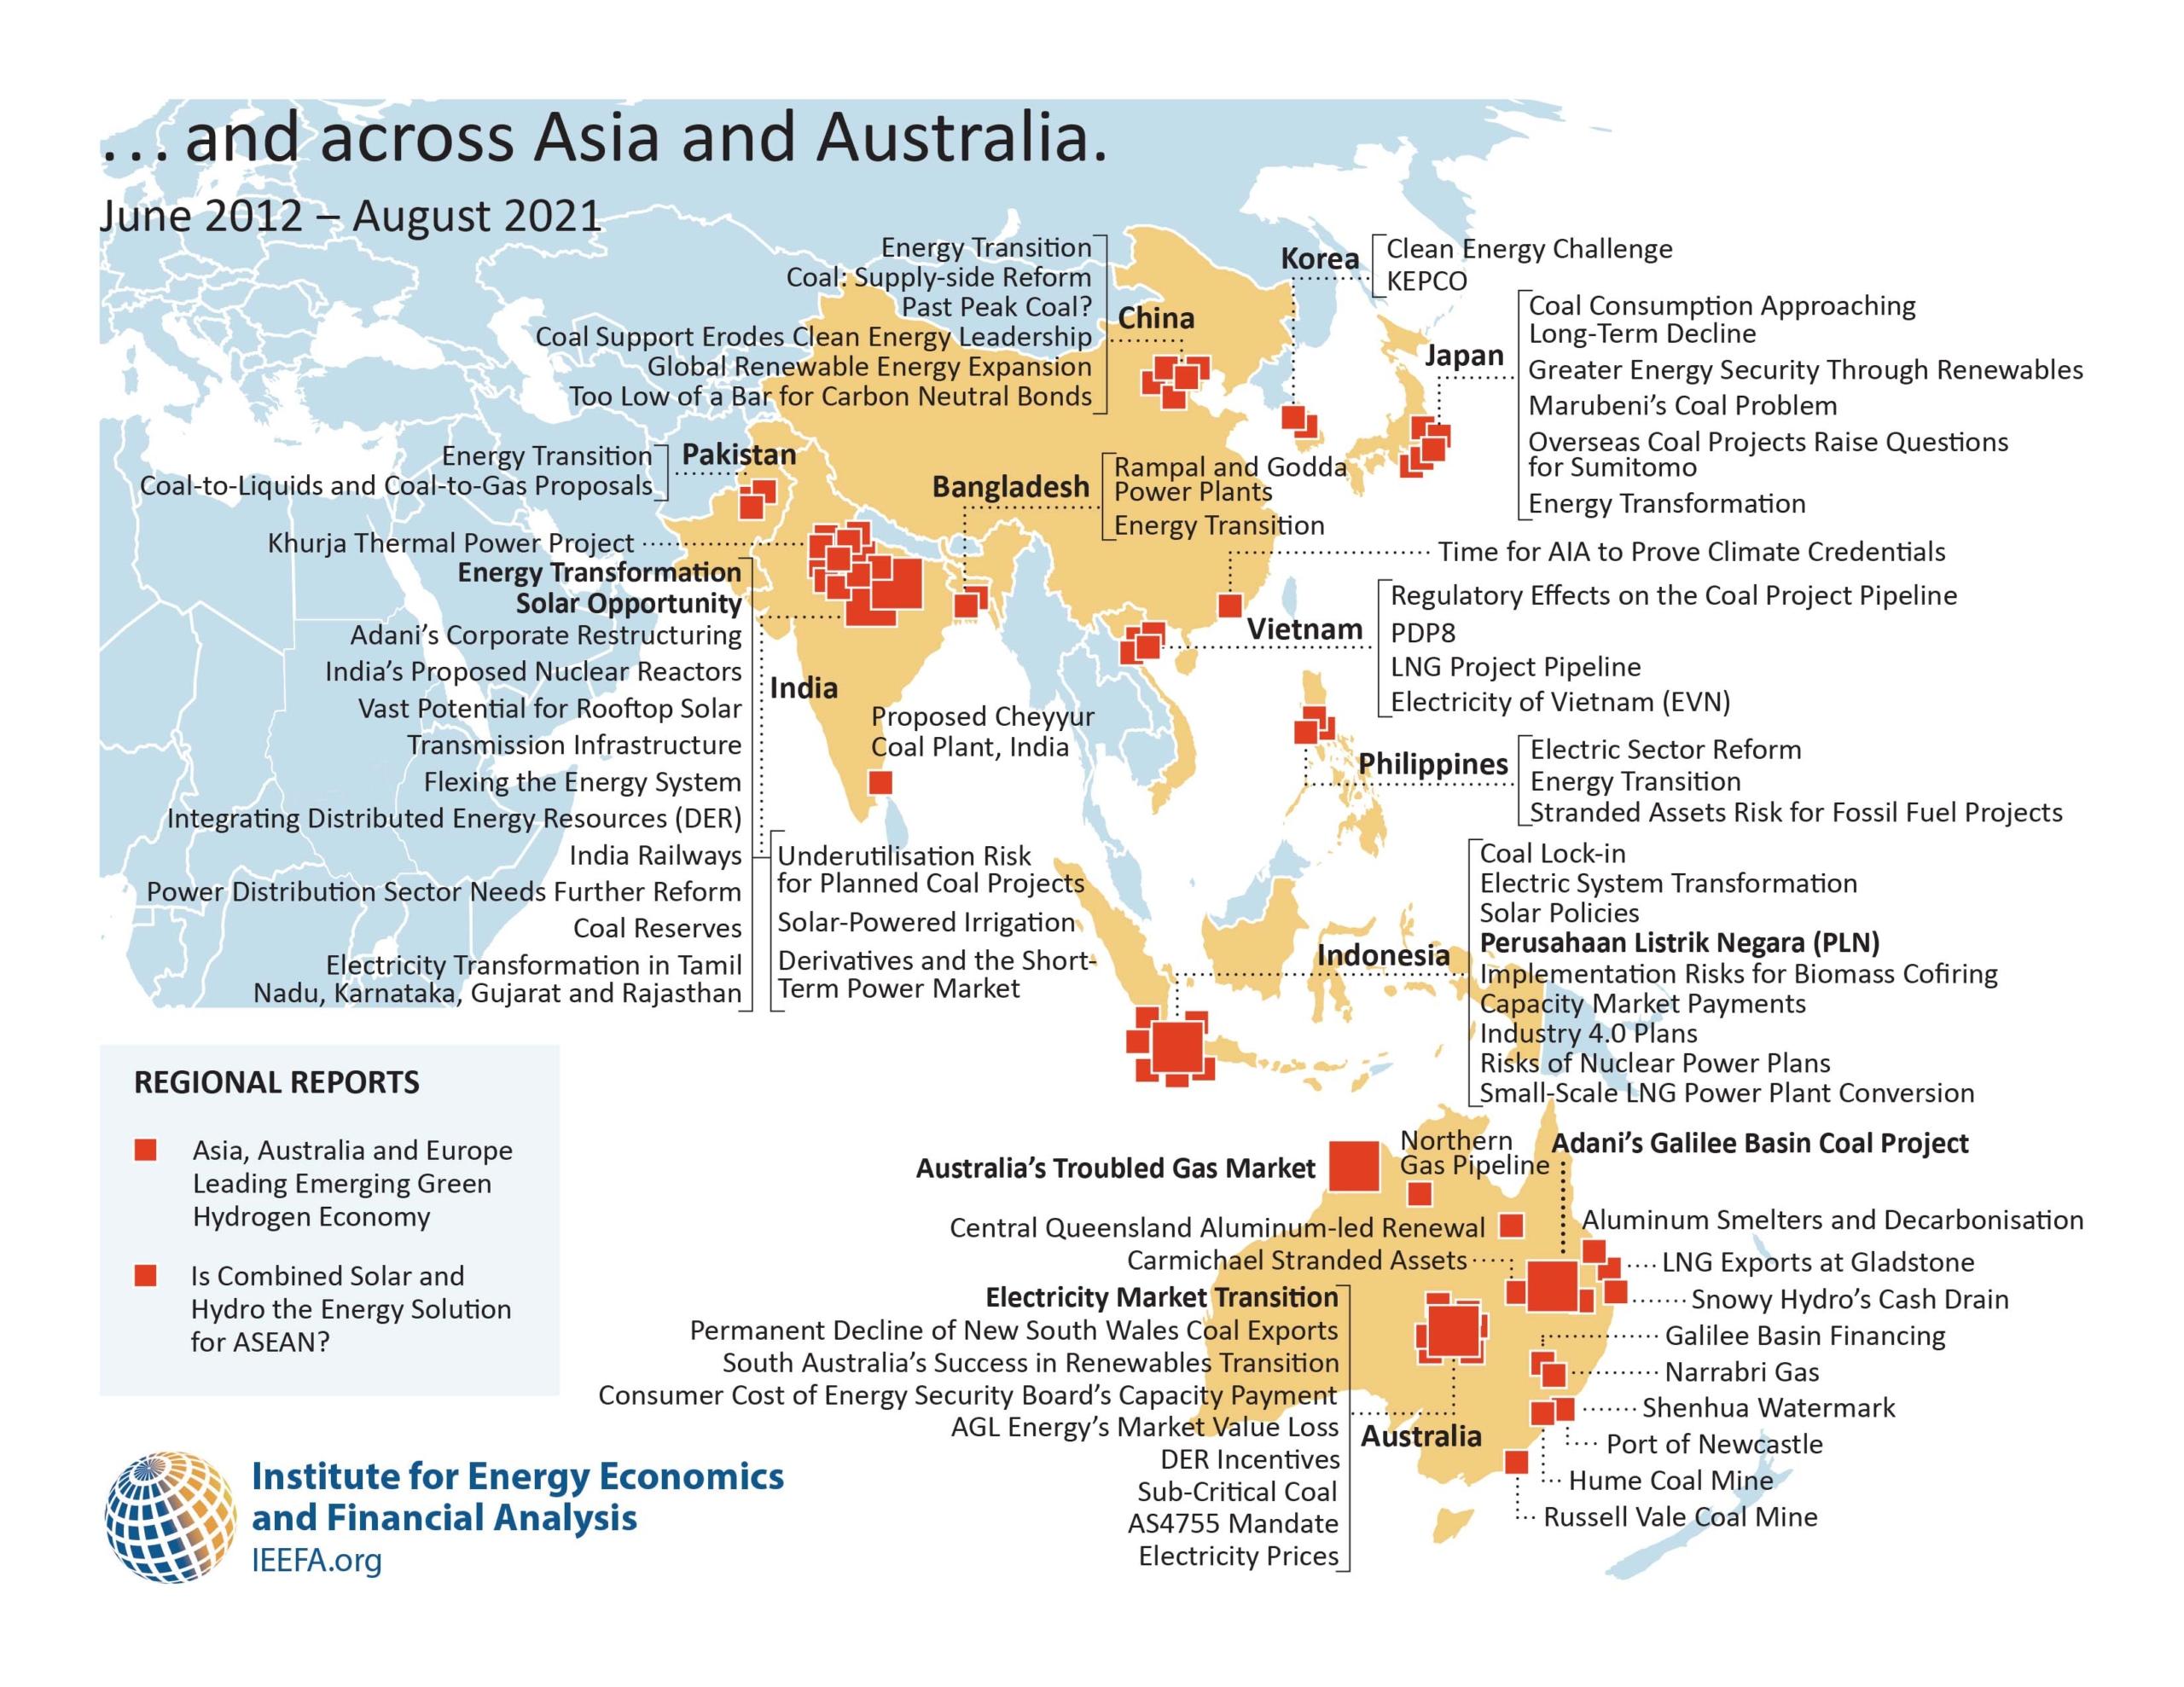 IEEFA Reports in Asia and Australia